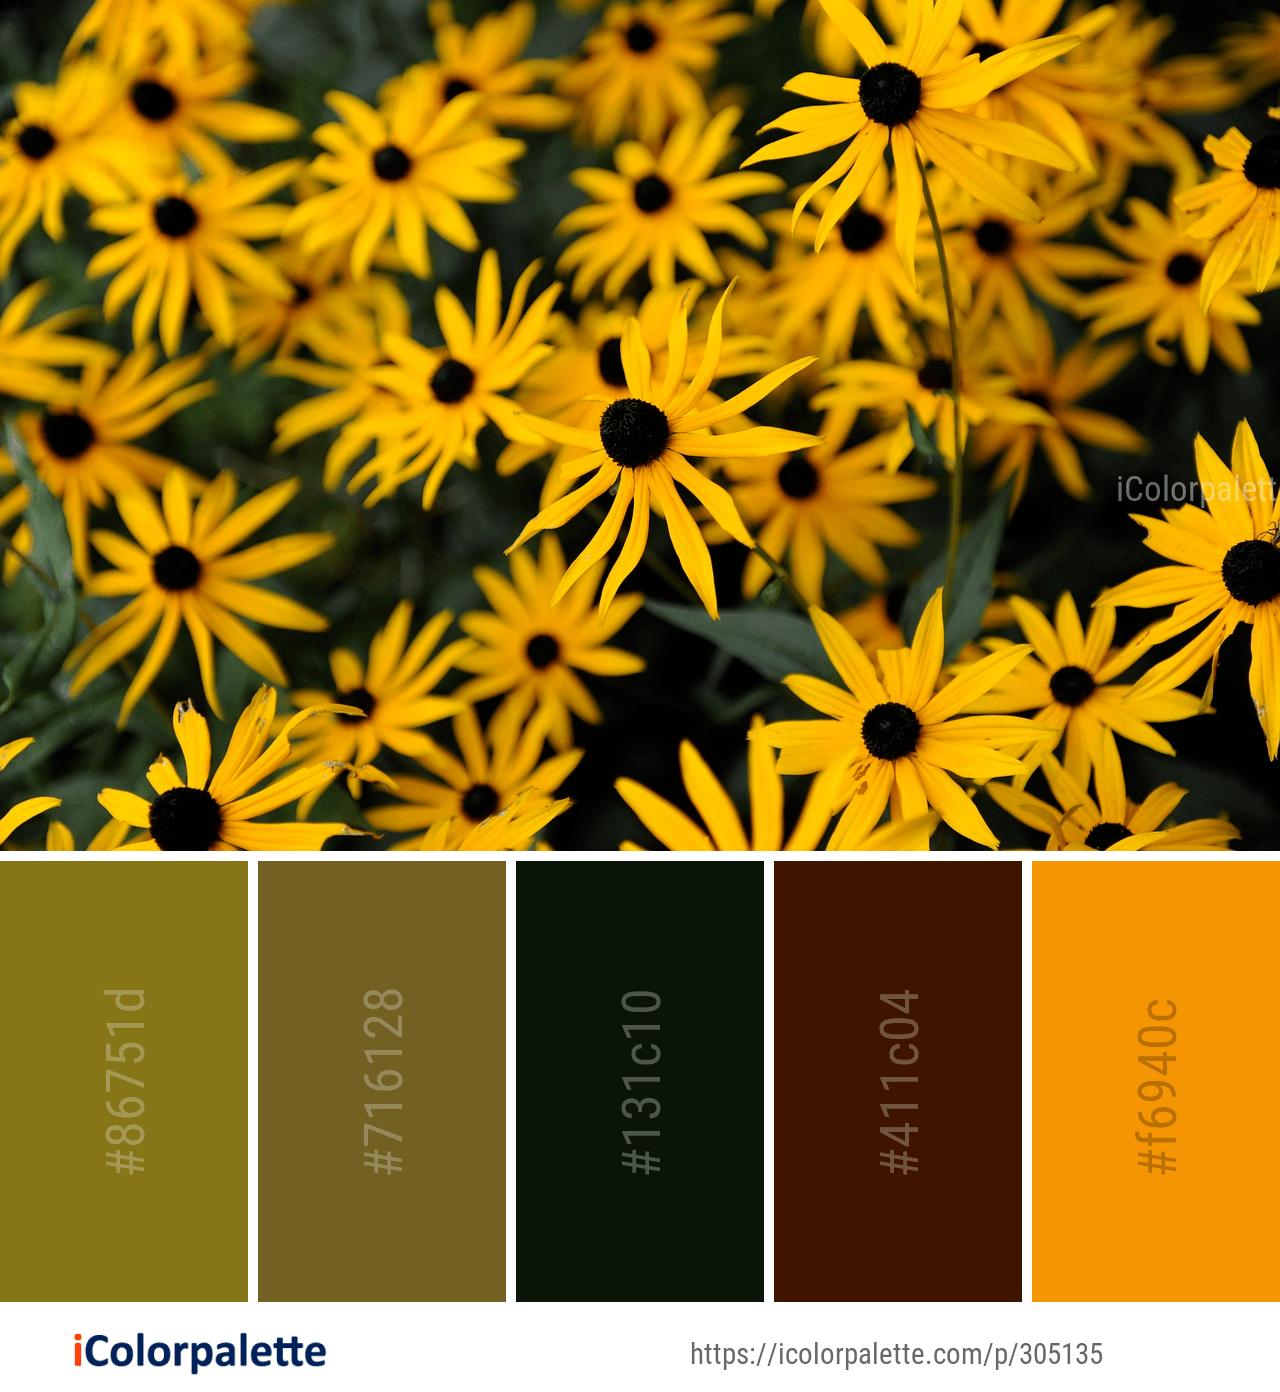 Color Palette Ideas Icolorpalette Colors Inspiration Graphics Design Inspiration Beautiful Colorpalette Palettes Color Palette Color Colorful Flowers